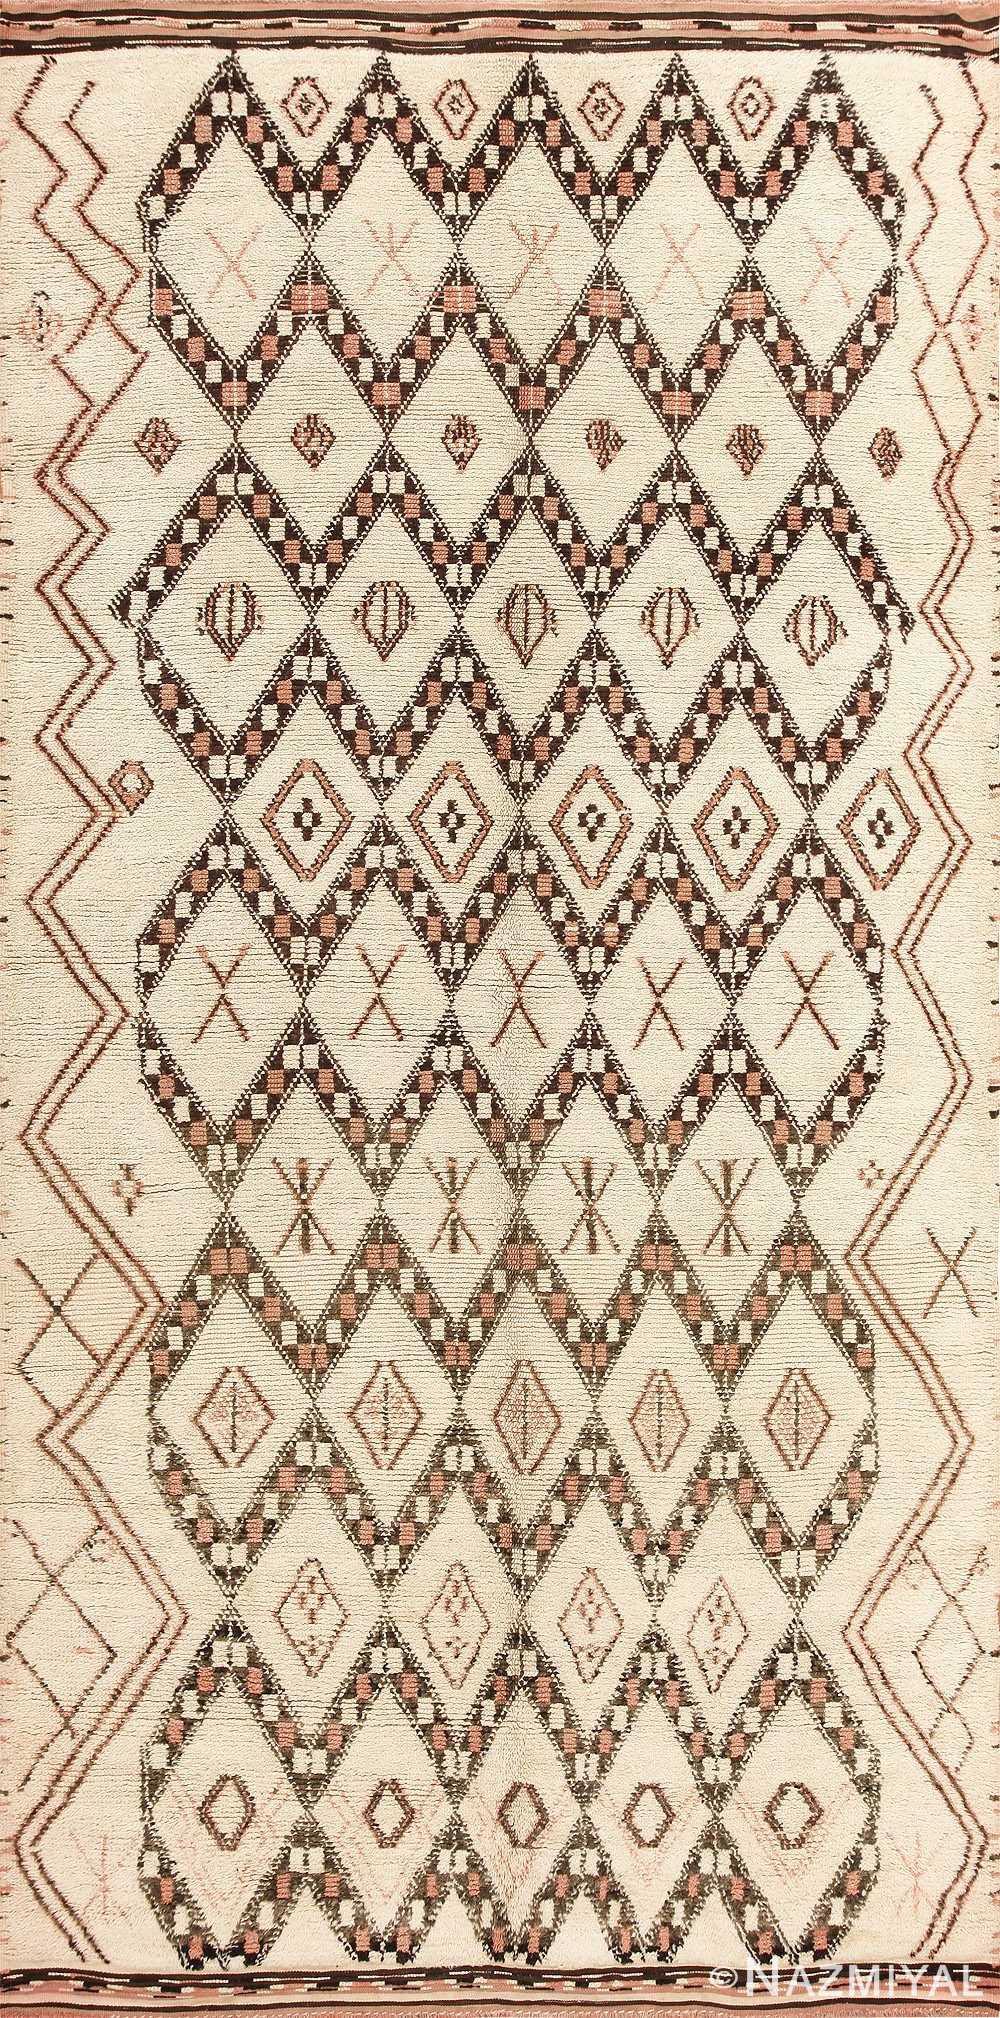 Vintage Moroccan Rug 47898 Large Image